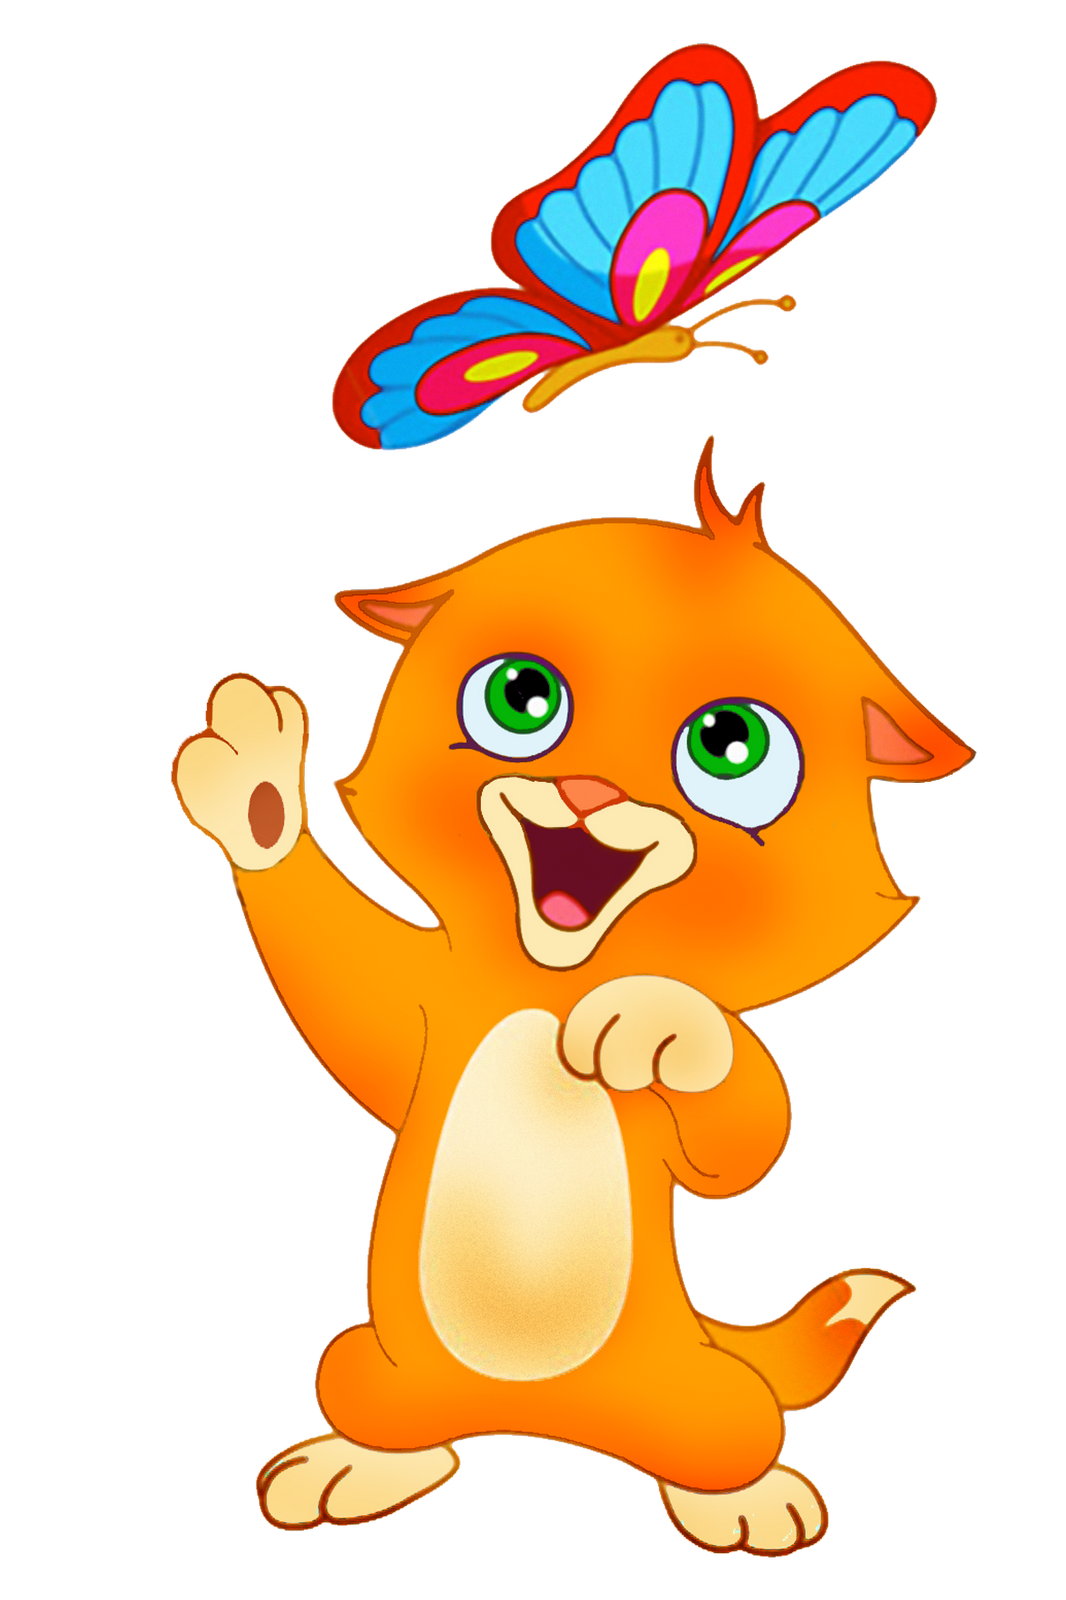 Dibujos a color gatos - Fotos de animales infantiles ...